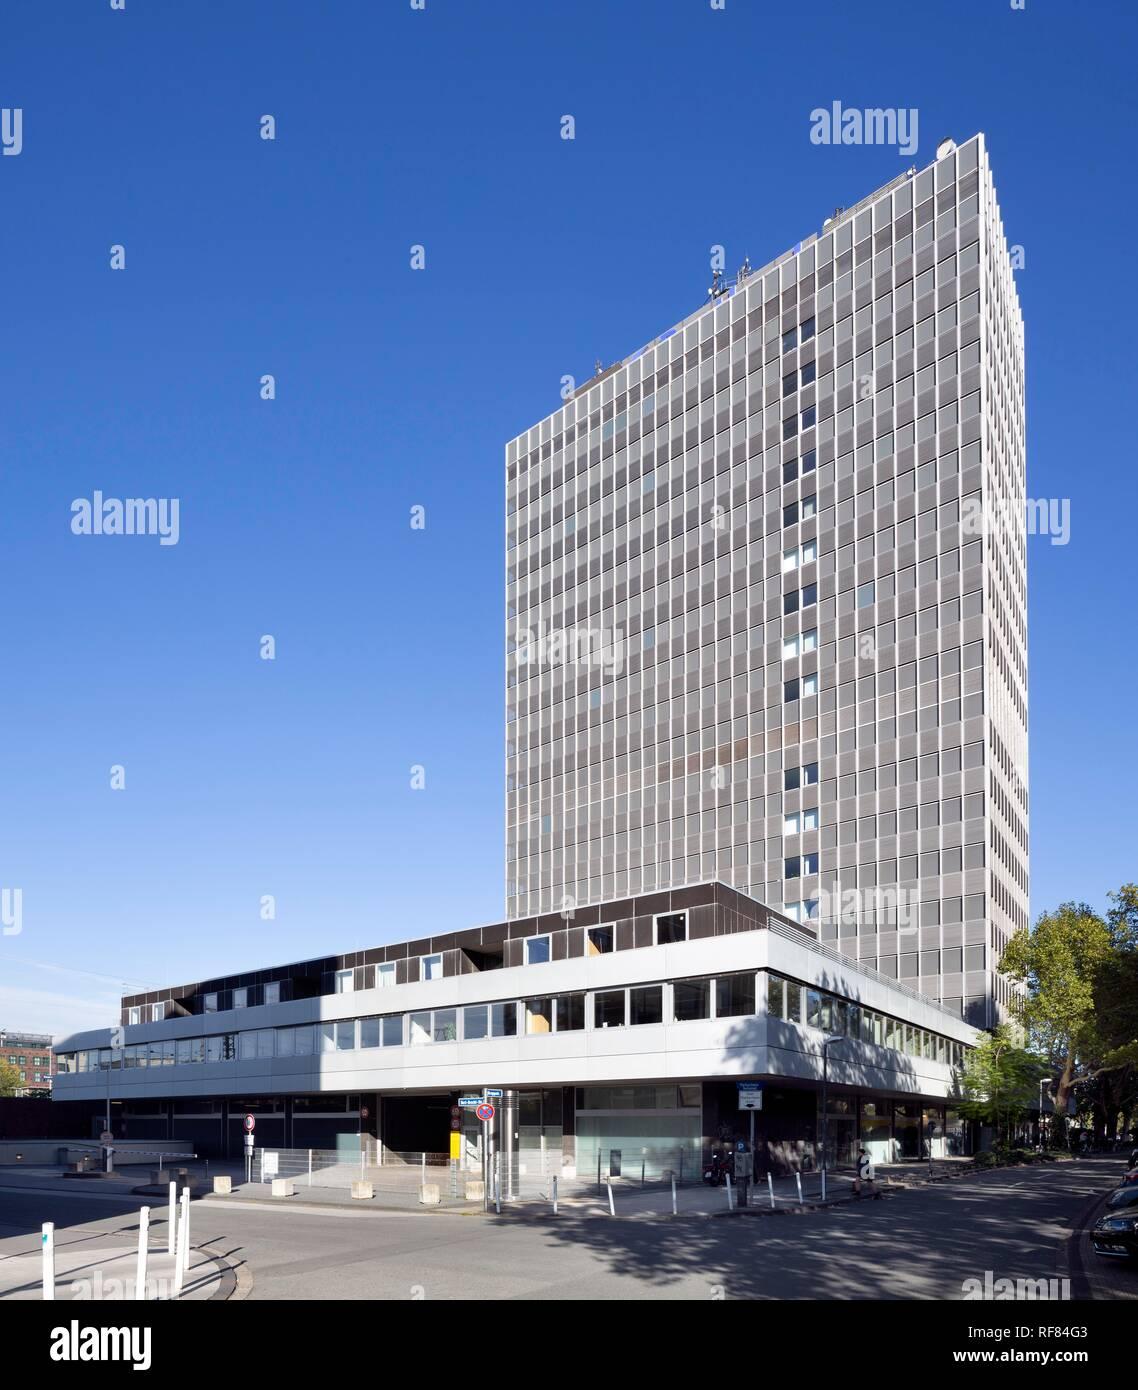 Postal check office or Postbank tower, Essen, Ruhr area, North Rhine-Westphalia, Germany - Stock Image